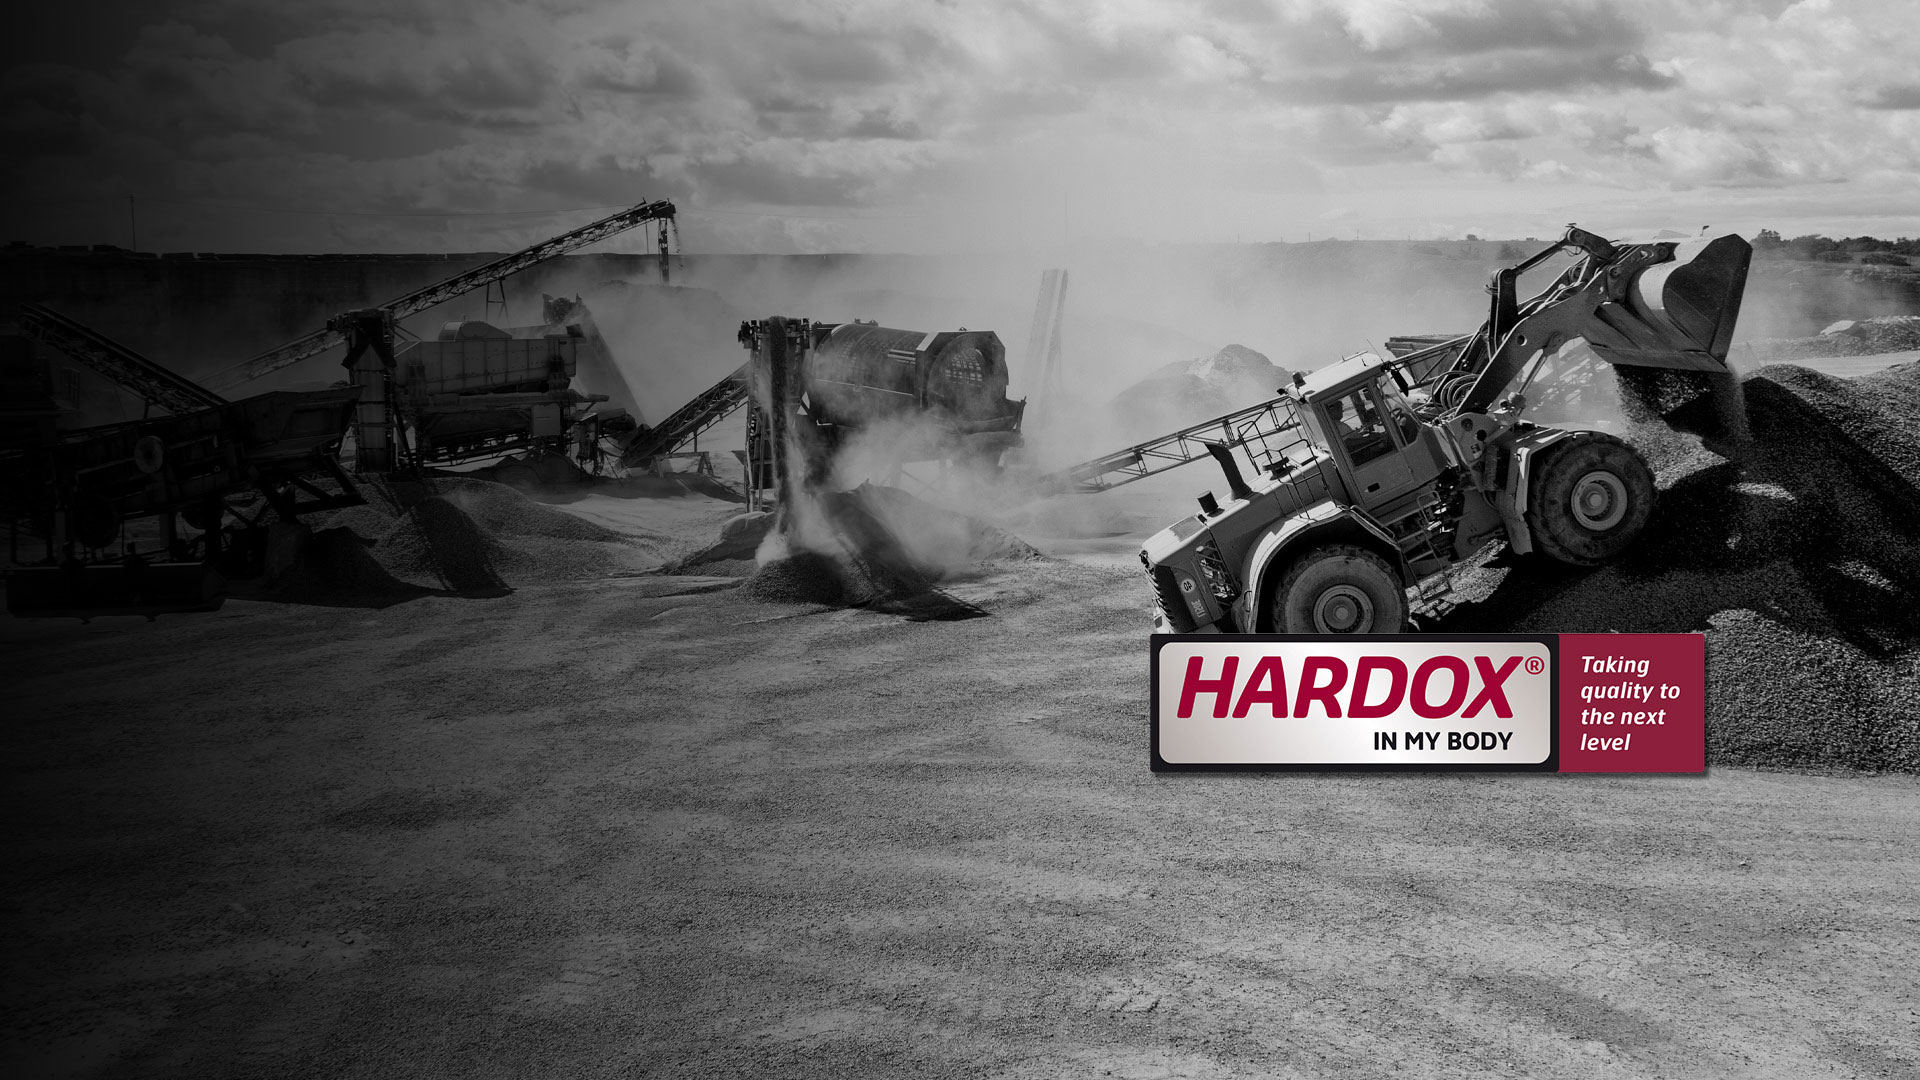 Hardox in My Body 혜택